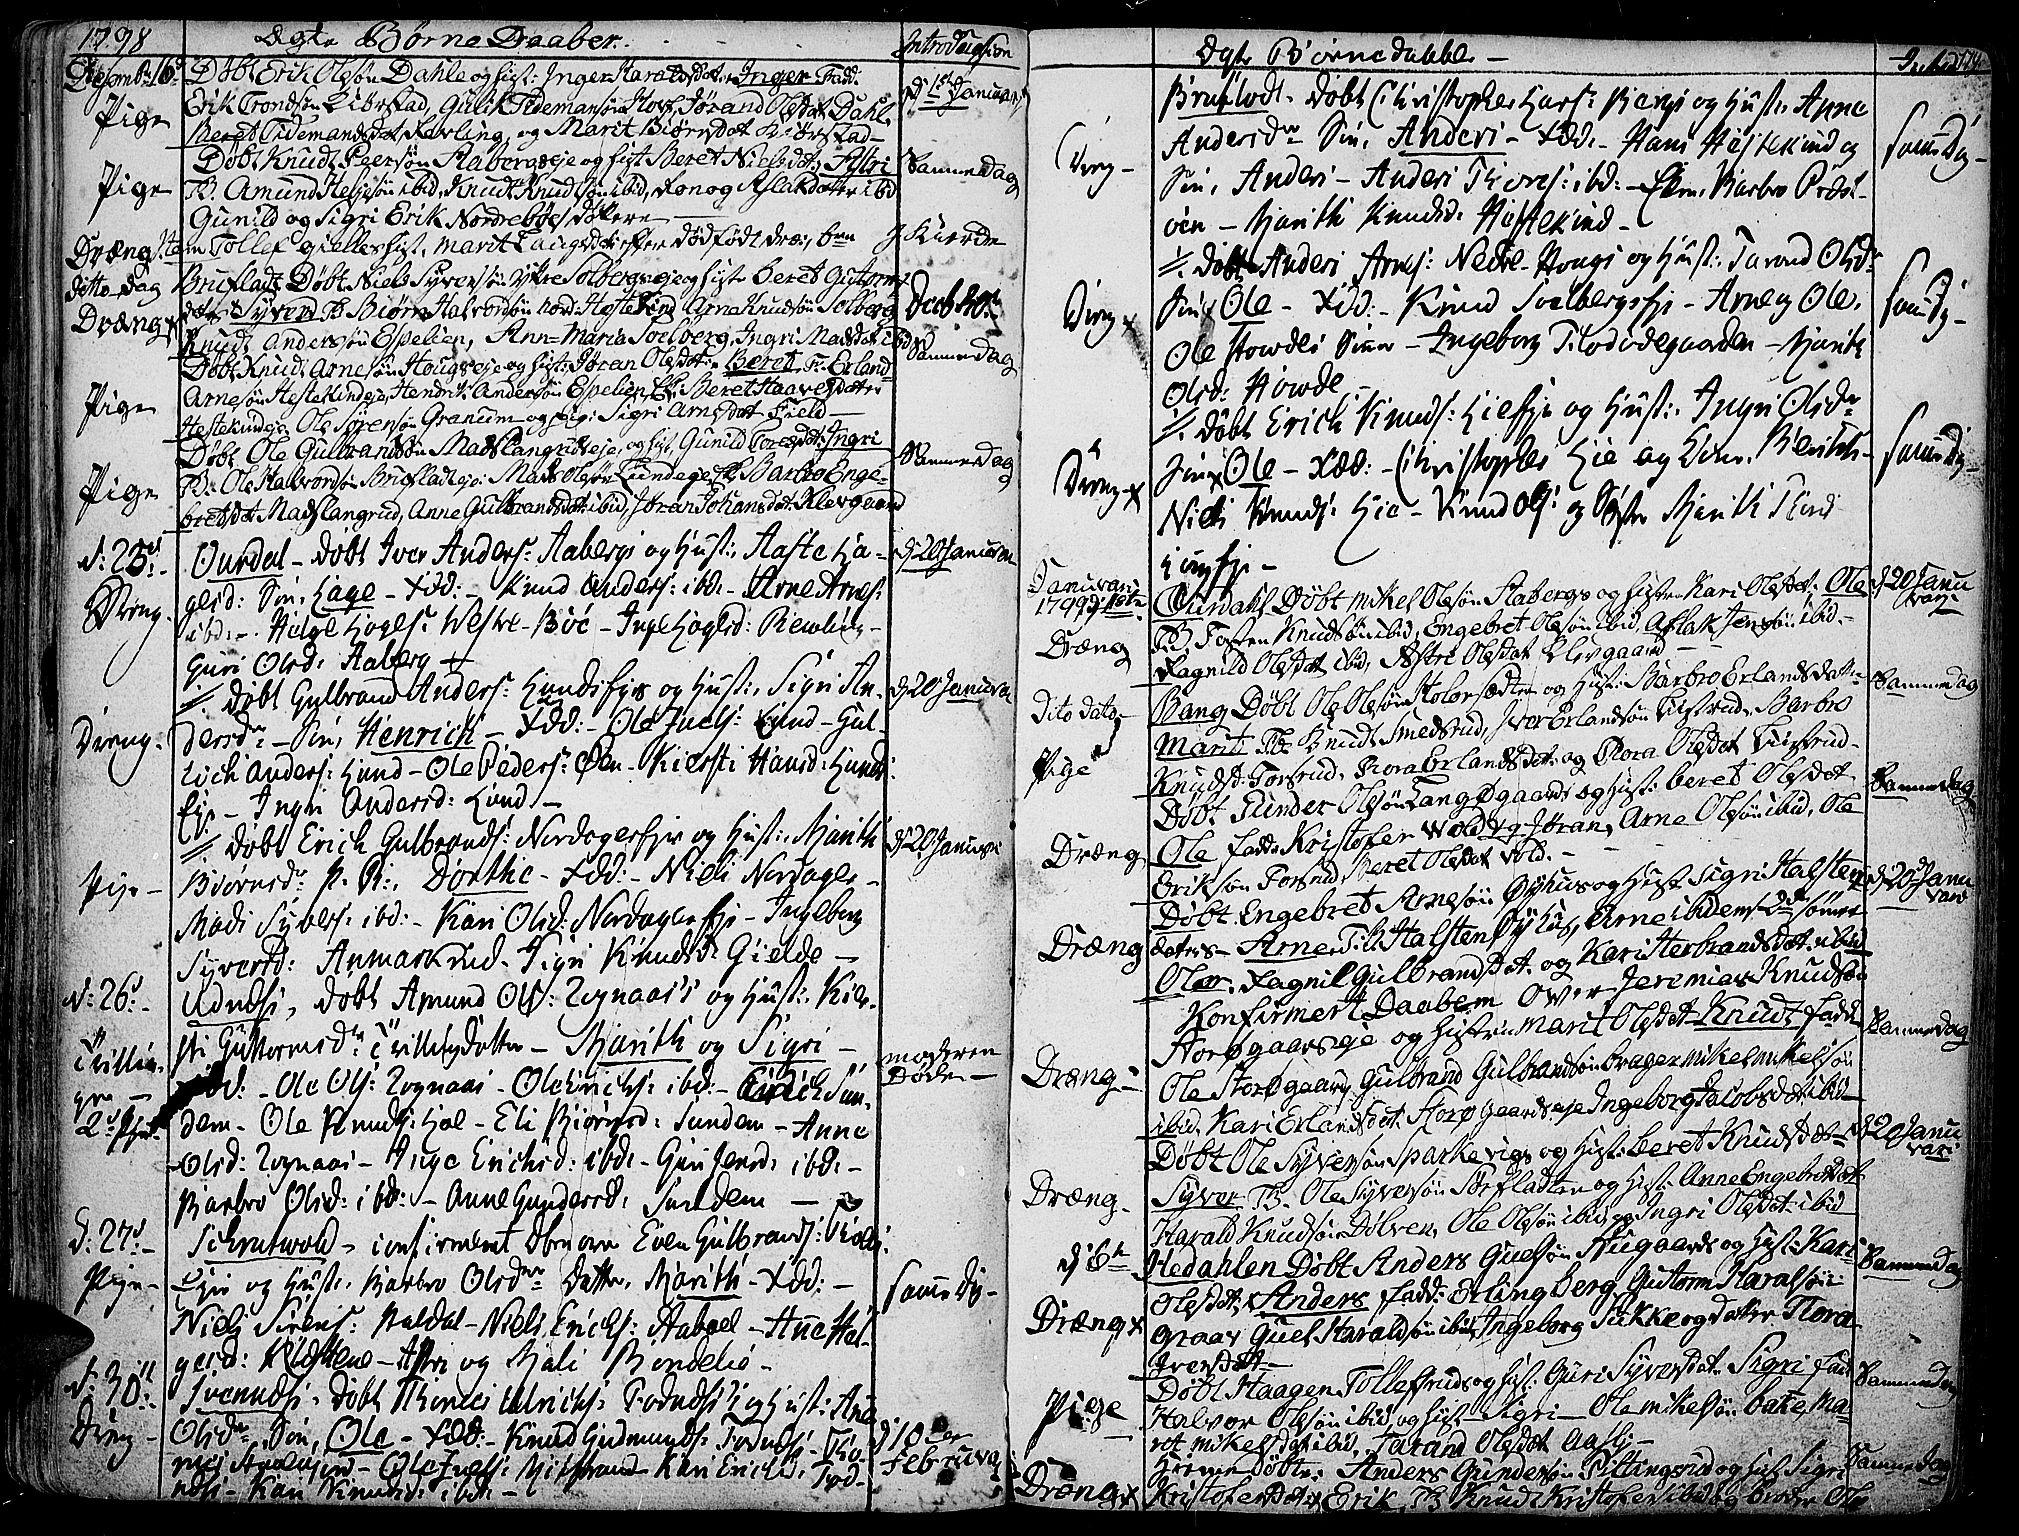 SAH, Aurdal prestekontor, Ministerialbok nr. 6, 1781-1804, s. 119